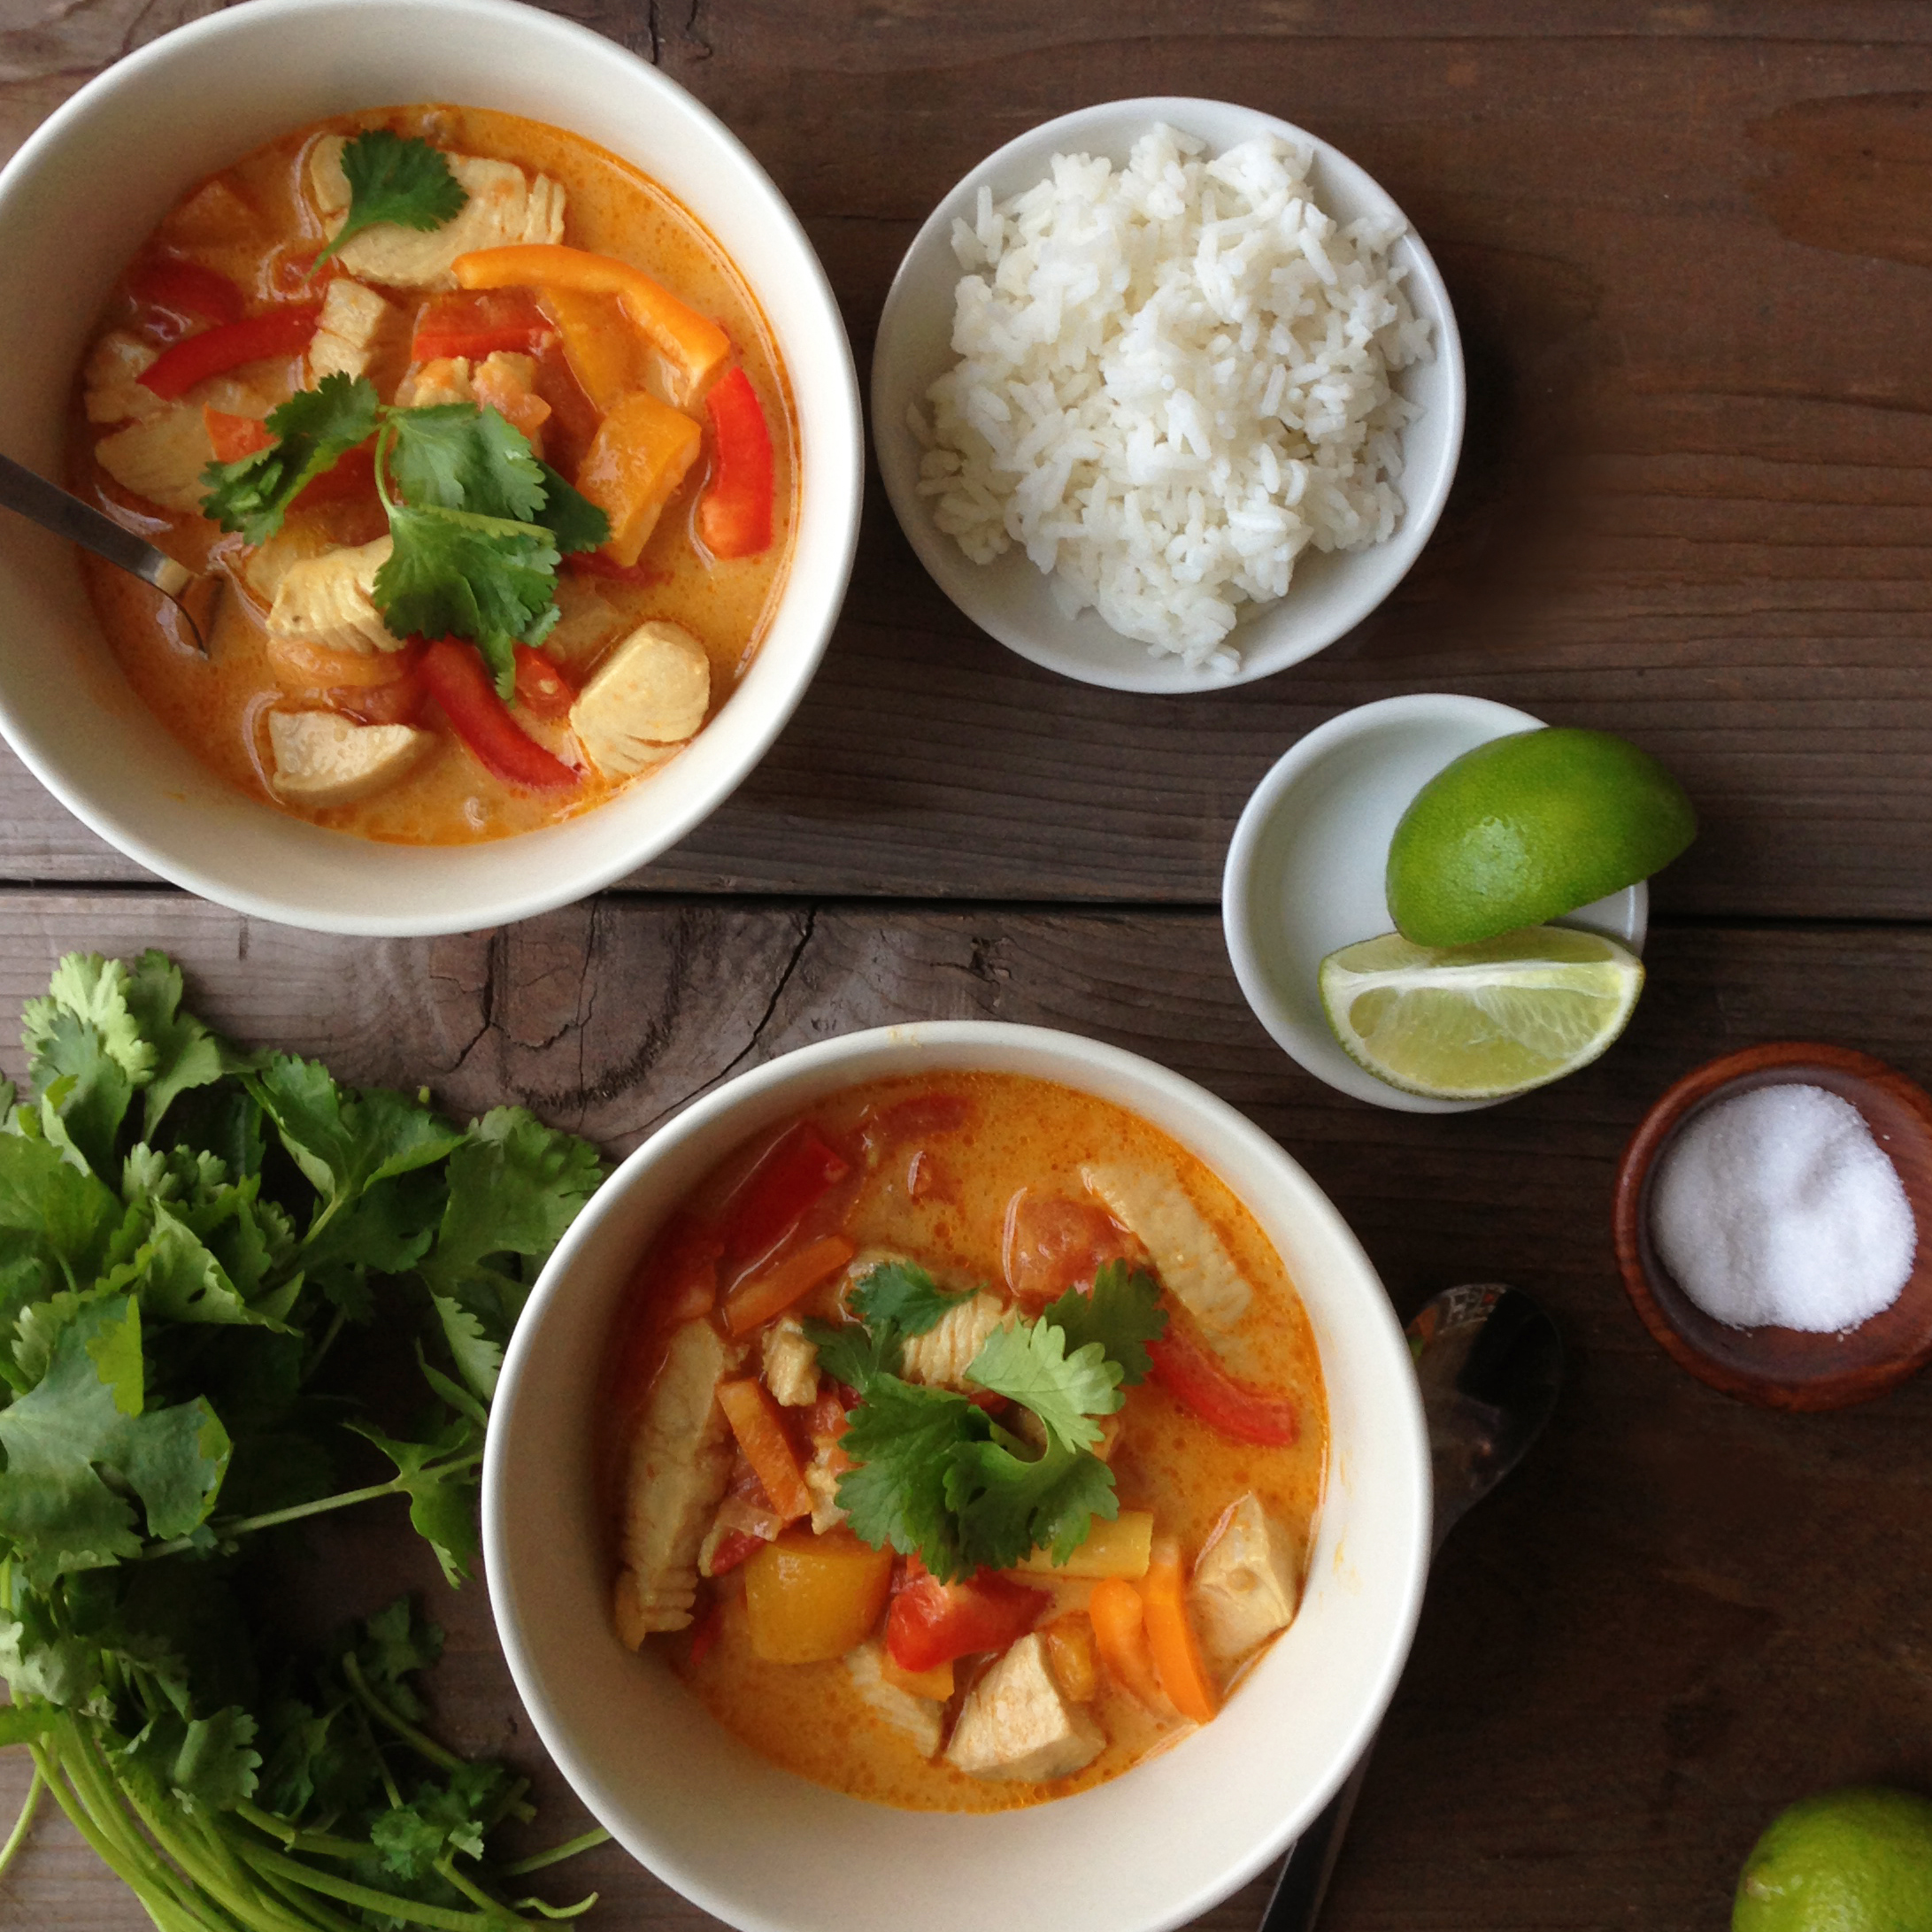 Thai lemongrass coconut soup